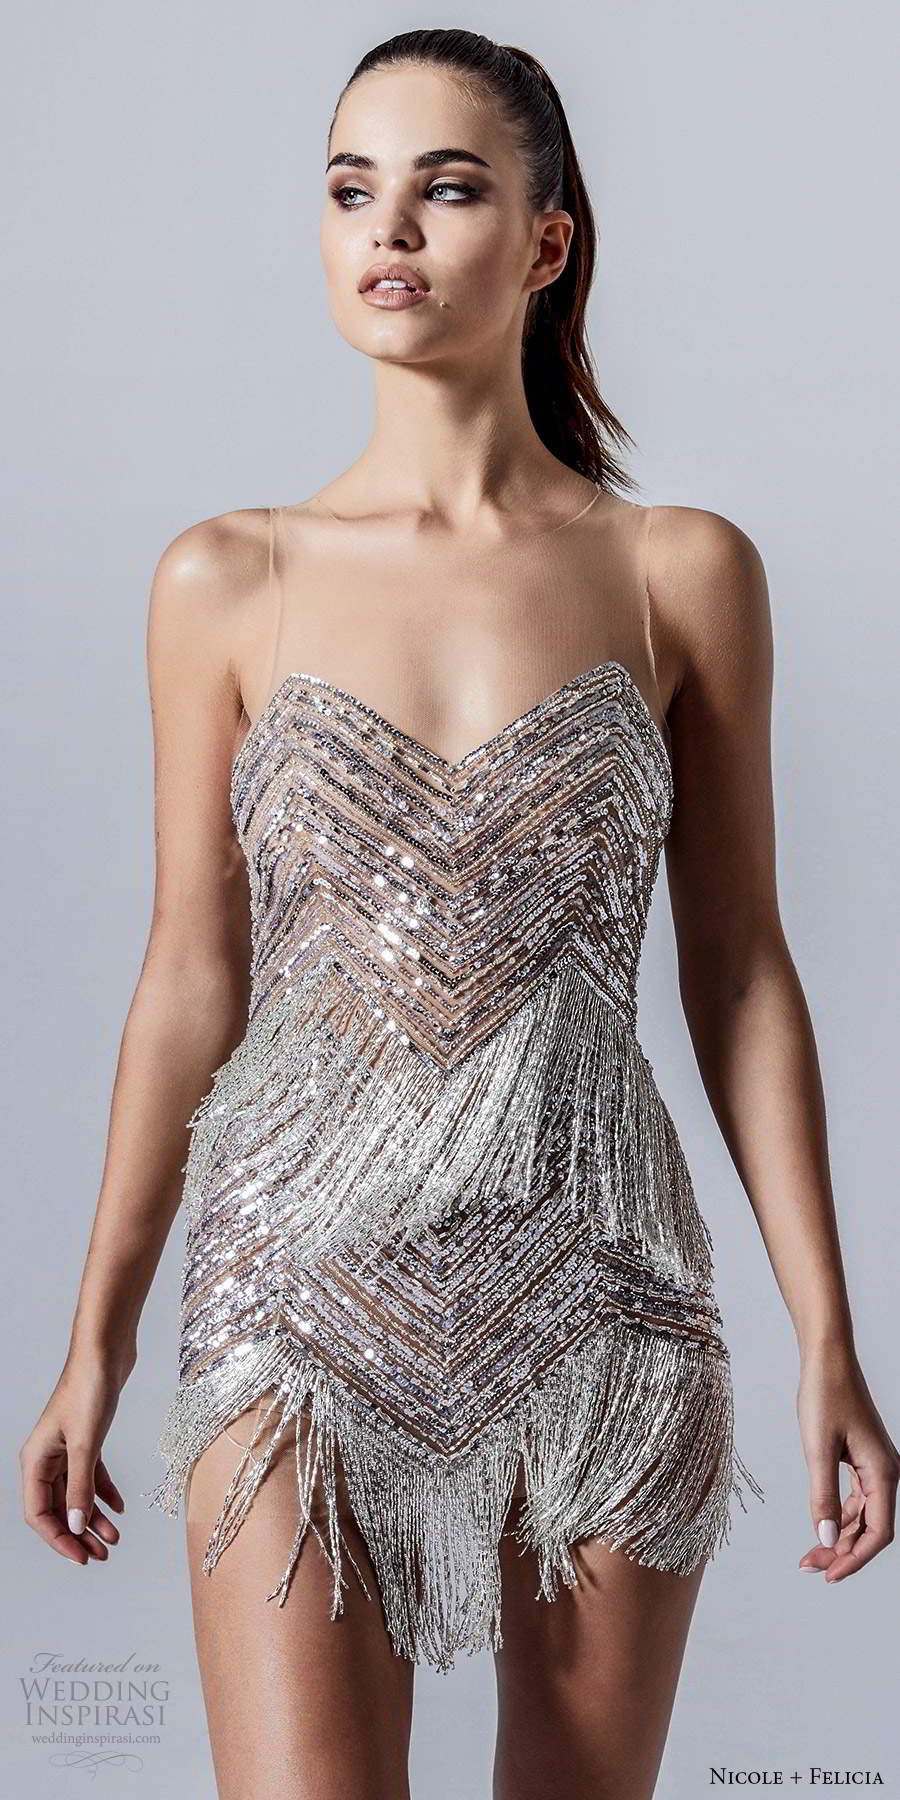 Nicole Felicia Fall 2020 Wedding Dresses Wedding Inspirasi Short Wedding Dress Lovely Dresses 2020 Wedding Dresses [ 1800 x 900 Pixel ]